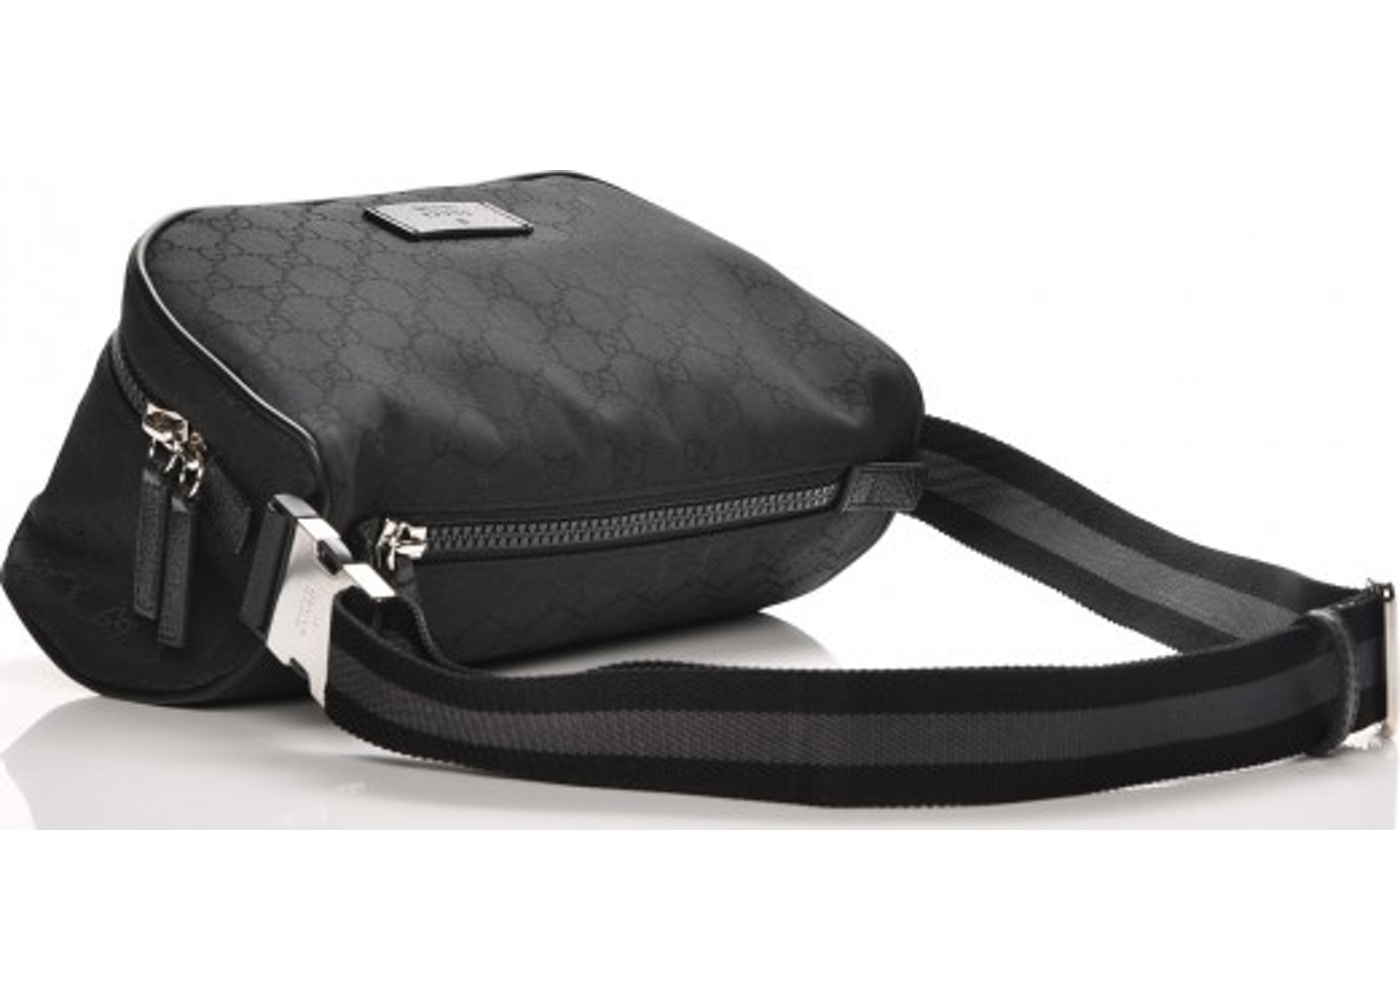 63b377493a1a Gucci Fanny Waist Bag Monogram GG Web Strap Black